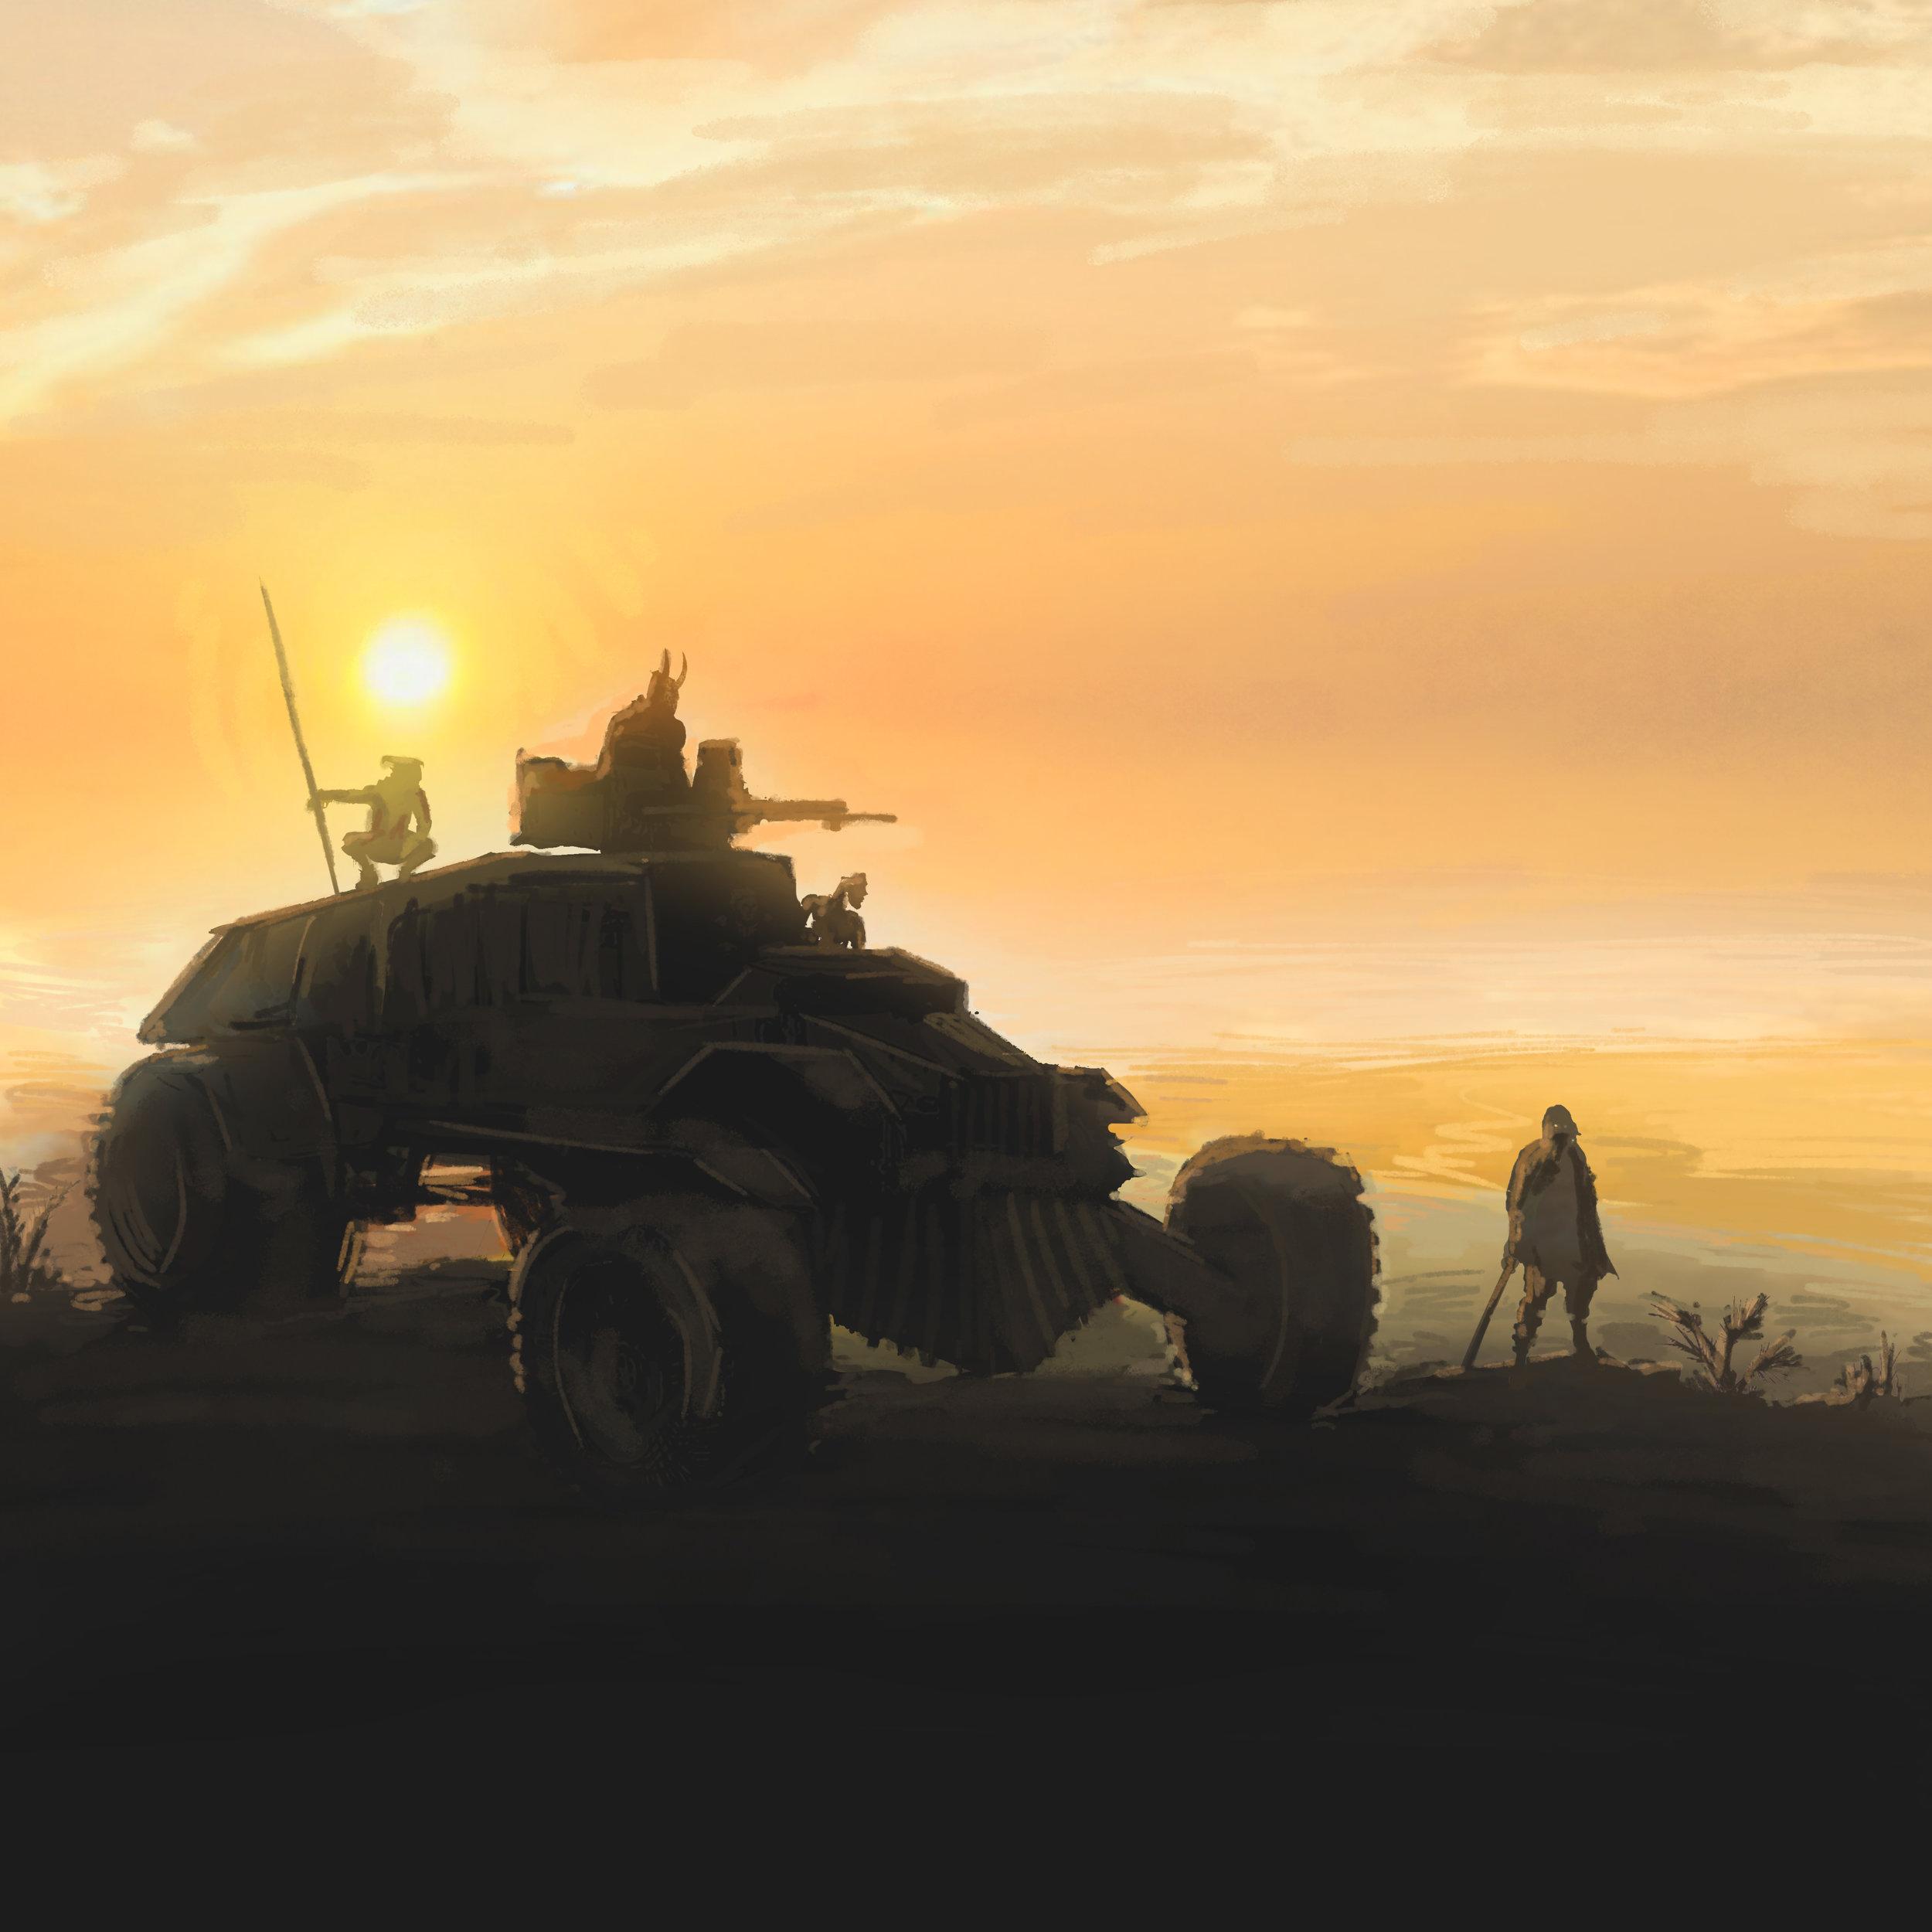 17-7-20 tank silhouette2.jpg